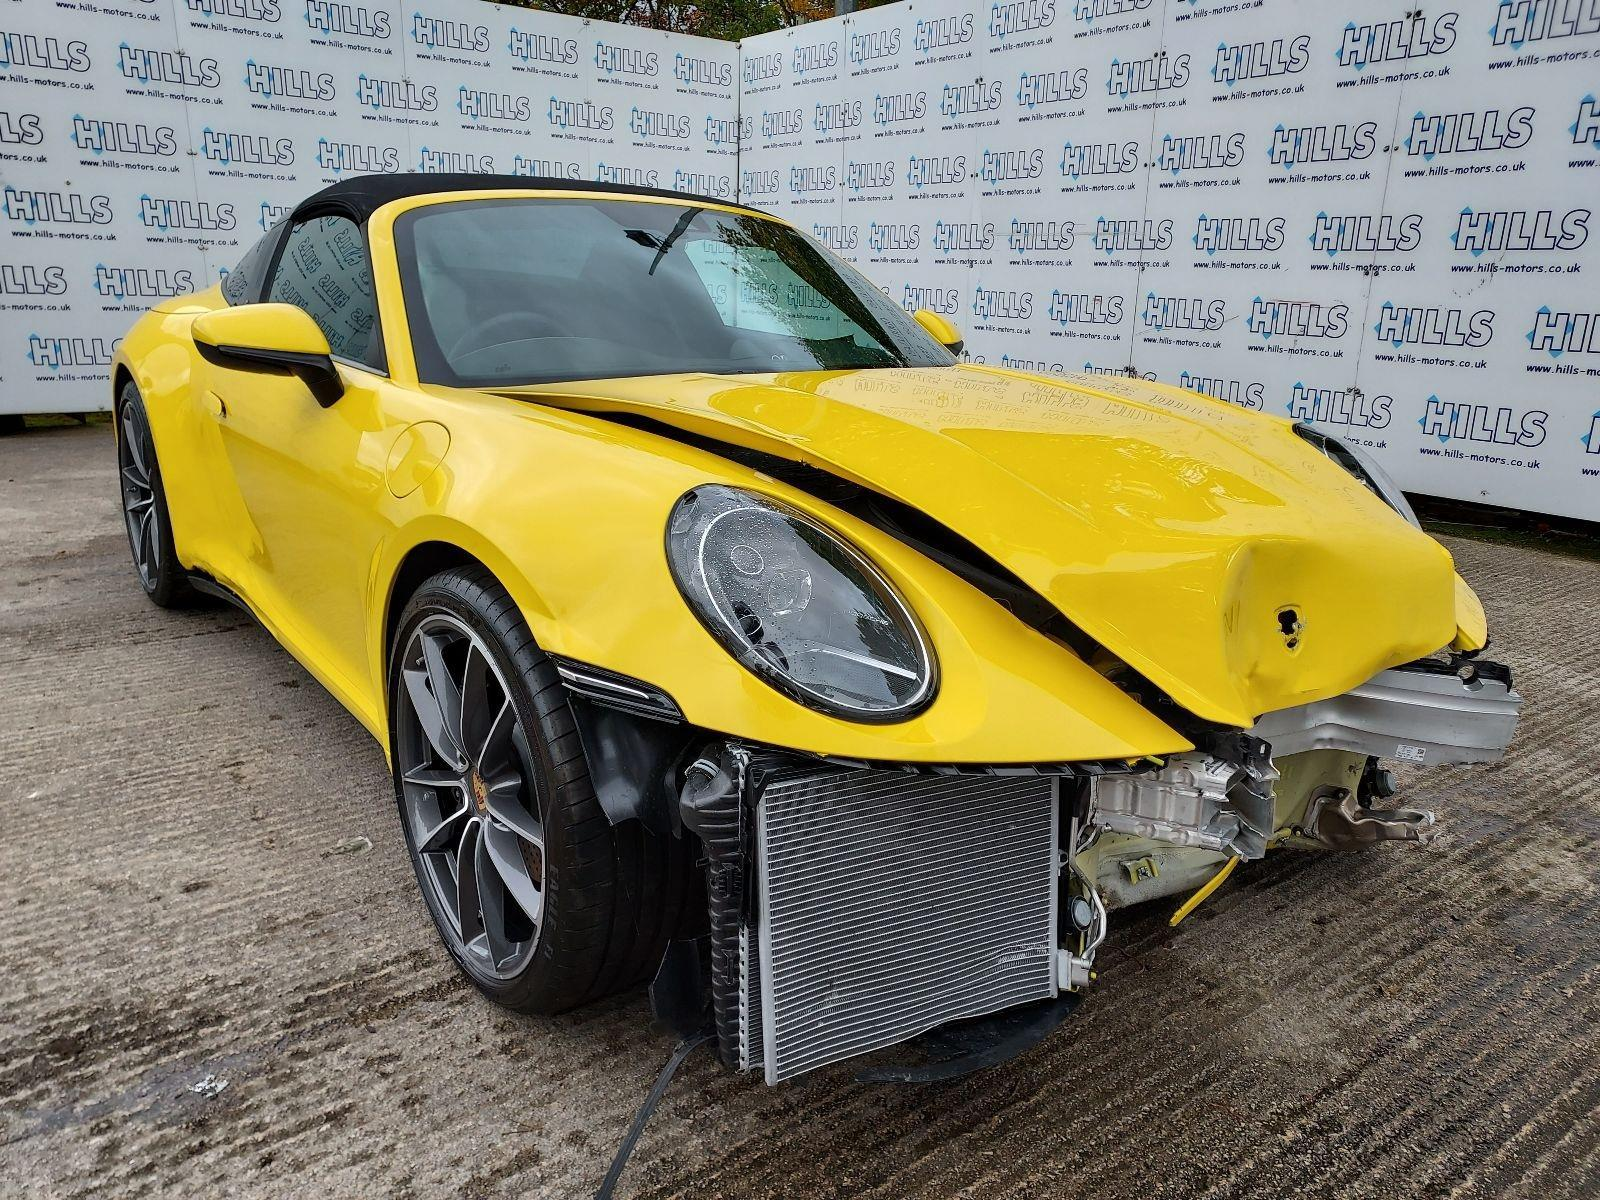 2021 Porsche 911 TARGA 4 PDK 2981cc TURBO Petrol Automatic 8 Speed CONVERTIBLE